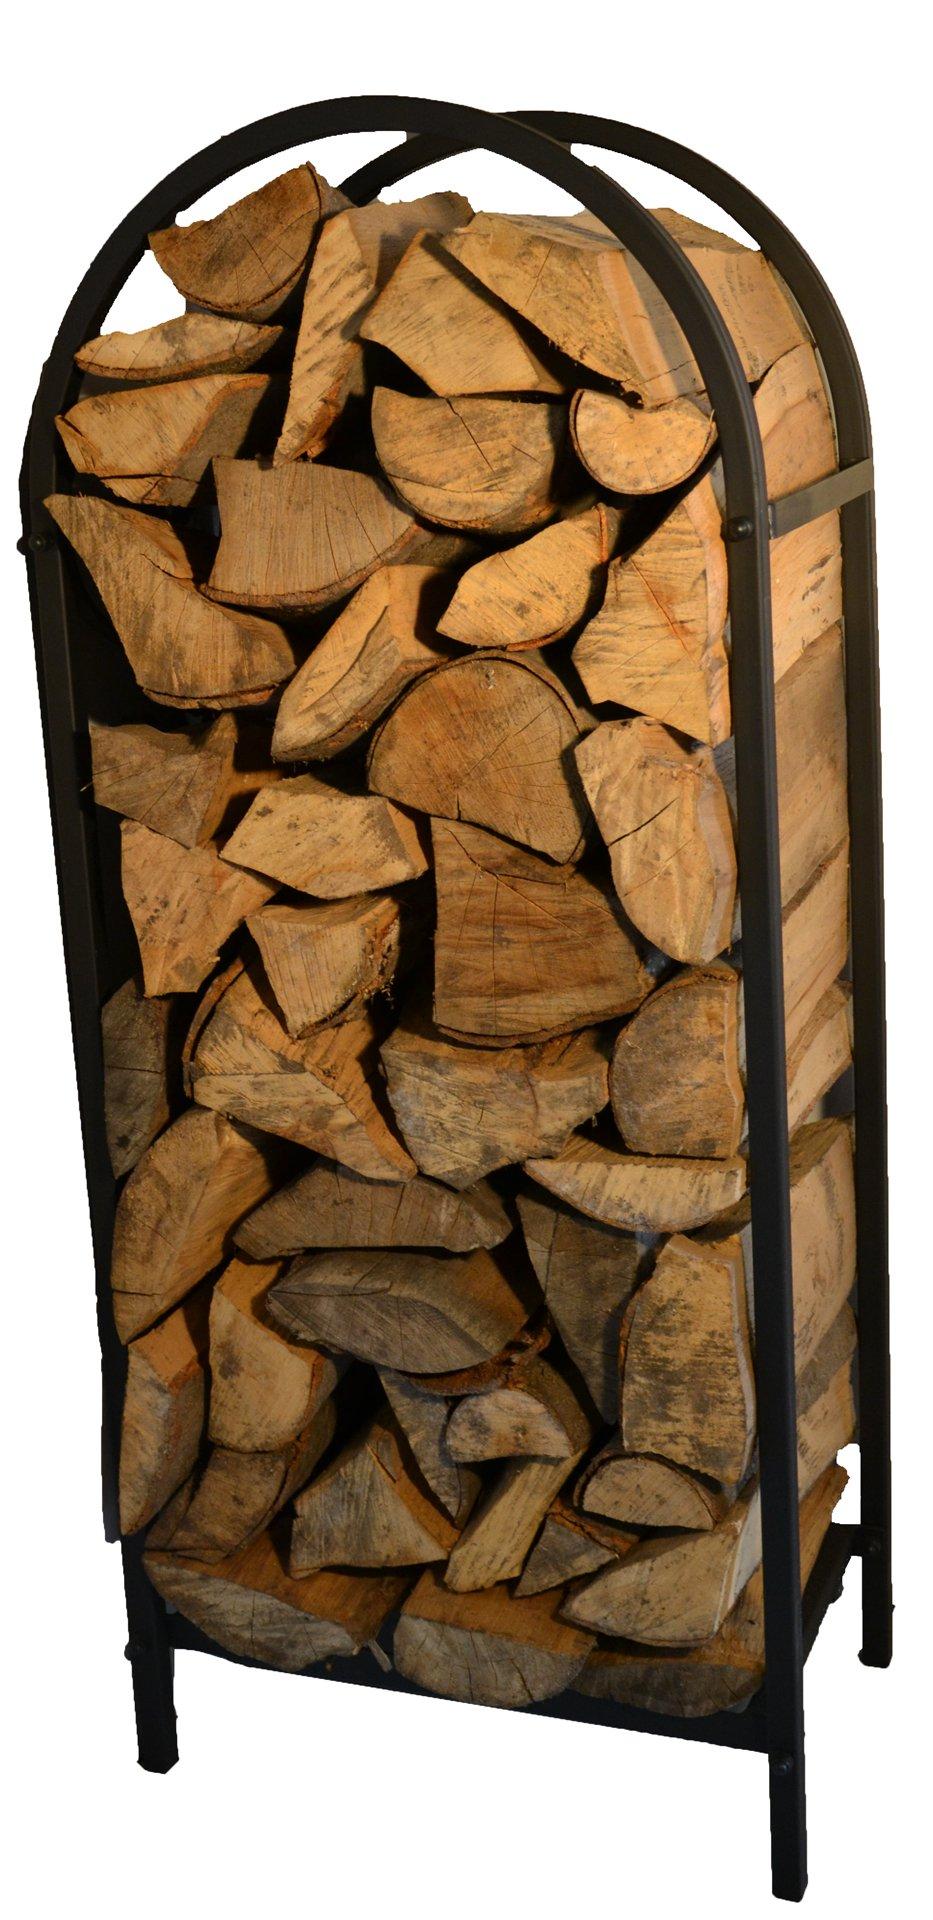 Стенд на дерево, дрова, металлическая корзина